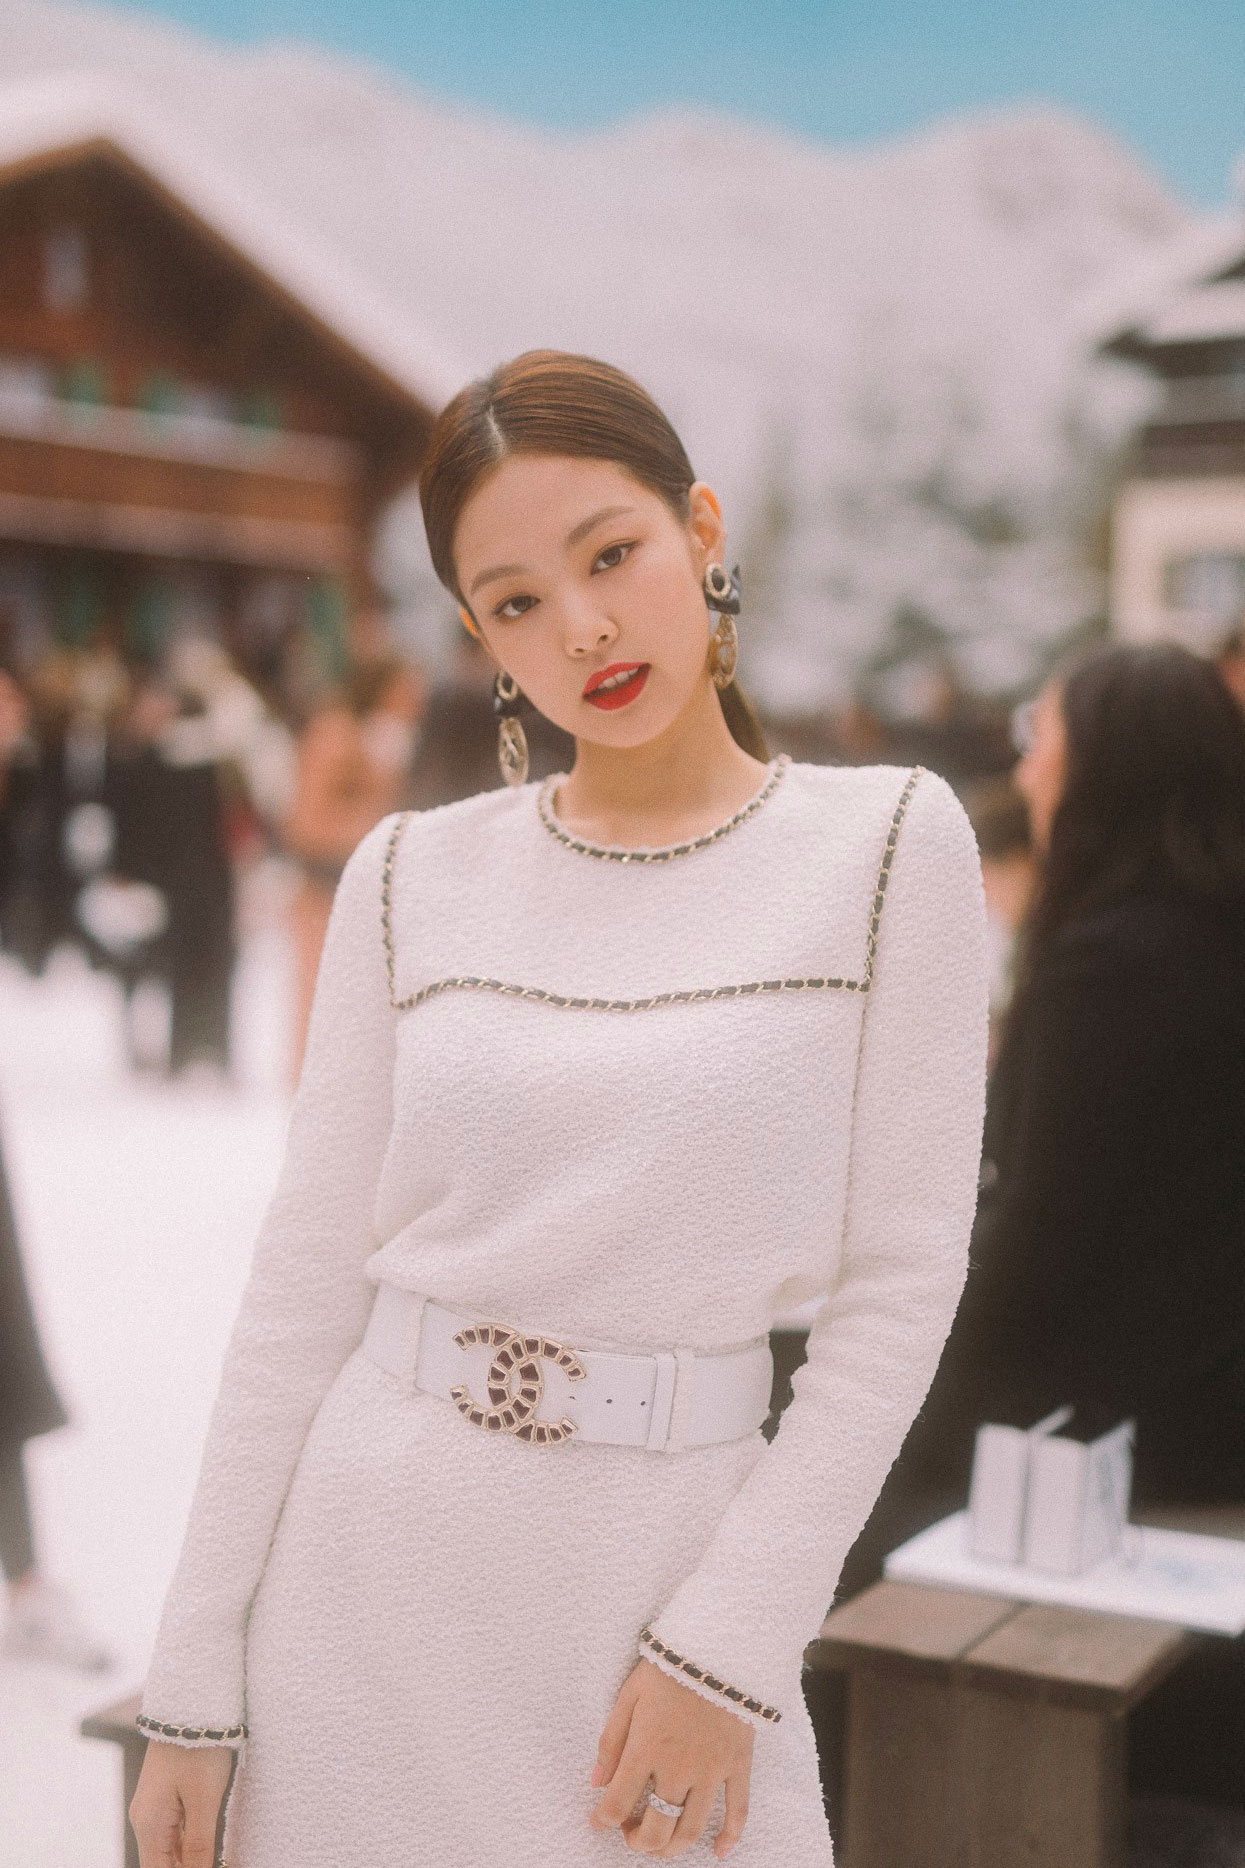 sao kpop Jennie tham dự show Chanel tại tuần lễ thời trang Paris vào tháng 3/2019